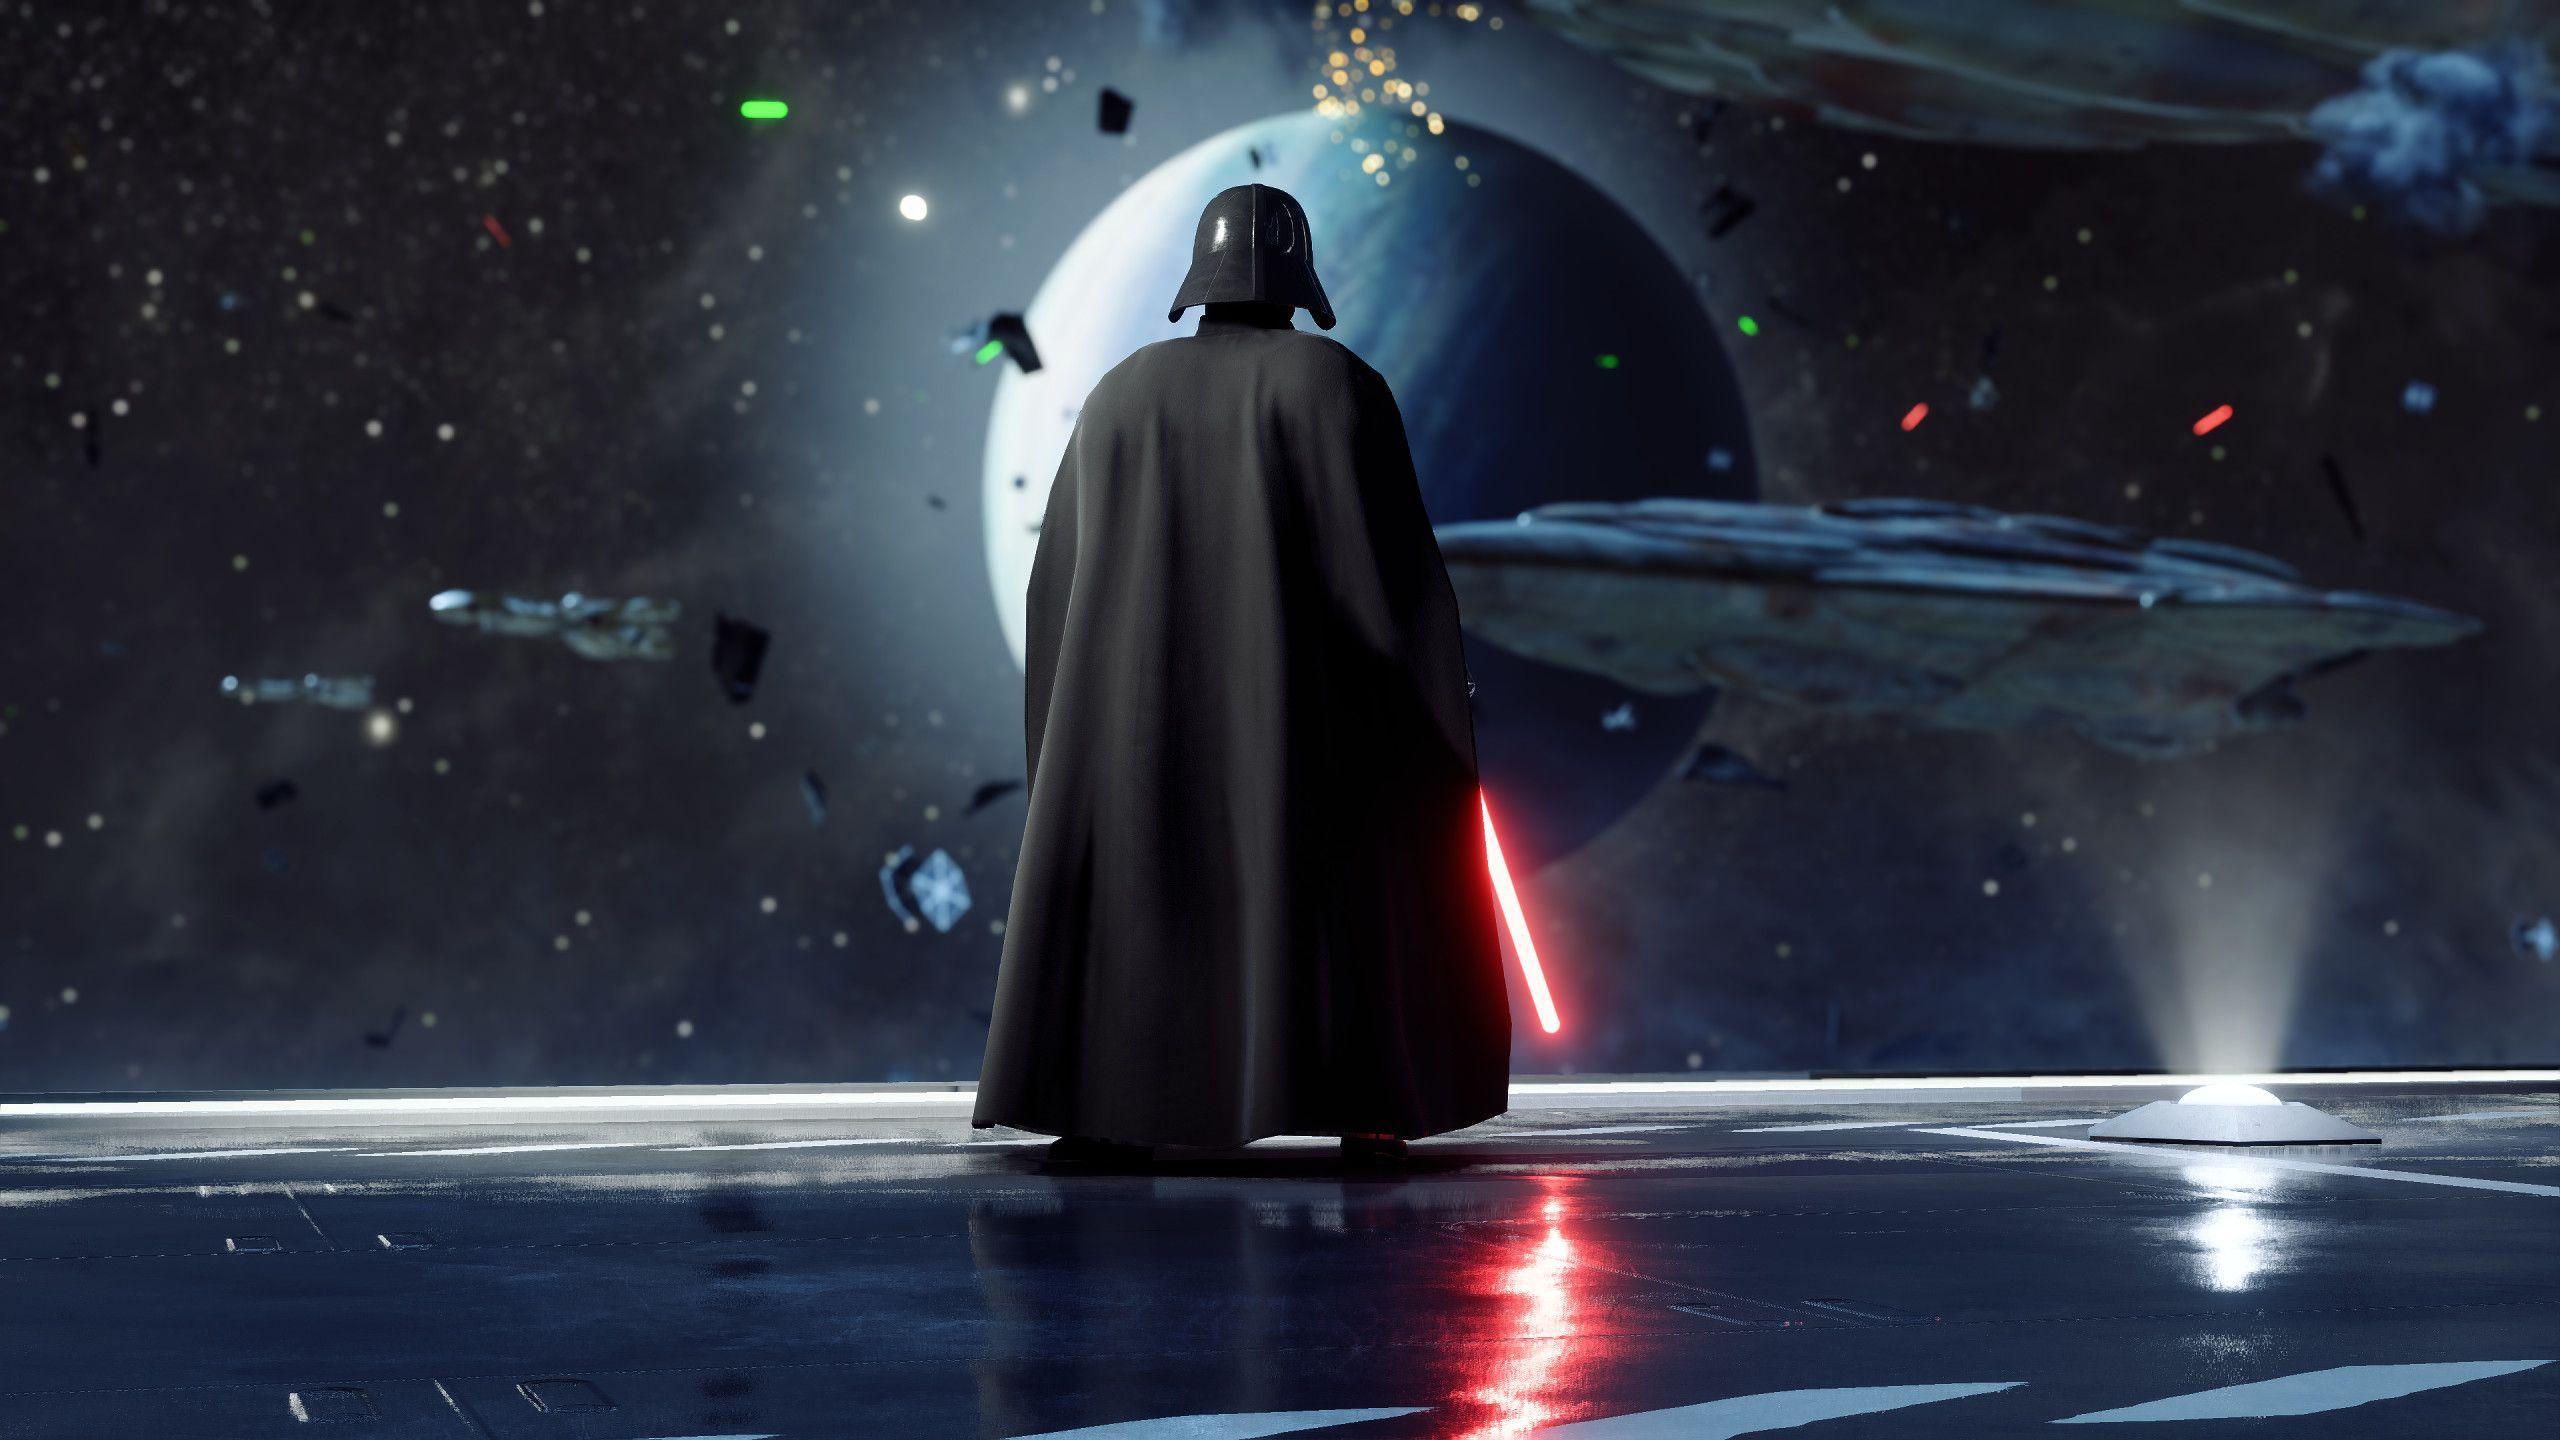 Darth Vader 4k Wallpapers Top Free Darth Vader 4k Backgrounds Wallpaperaccess